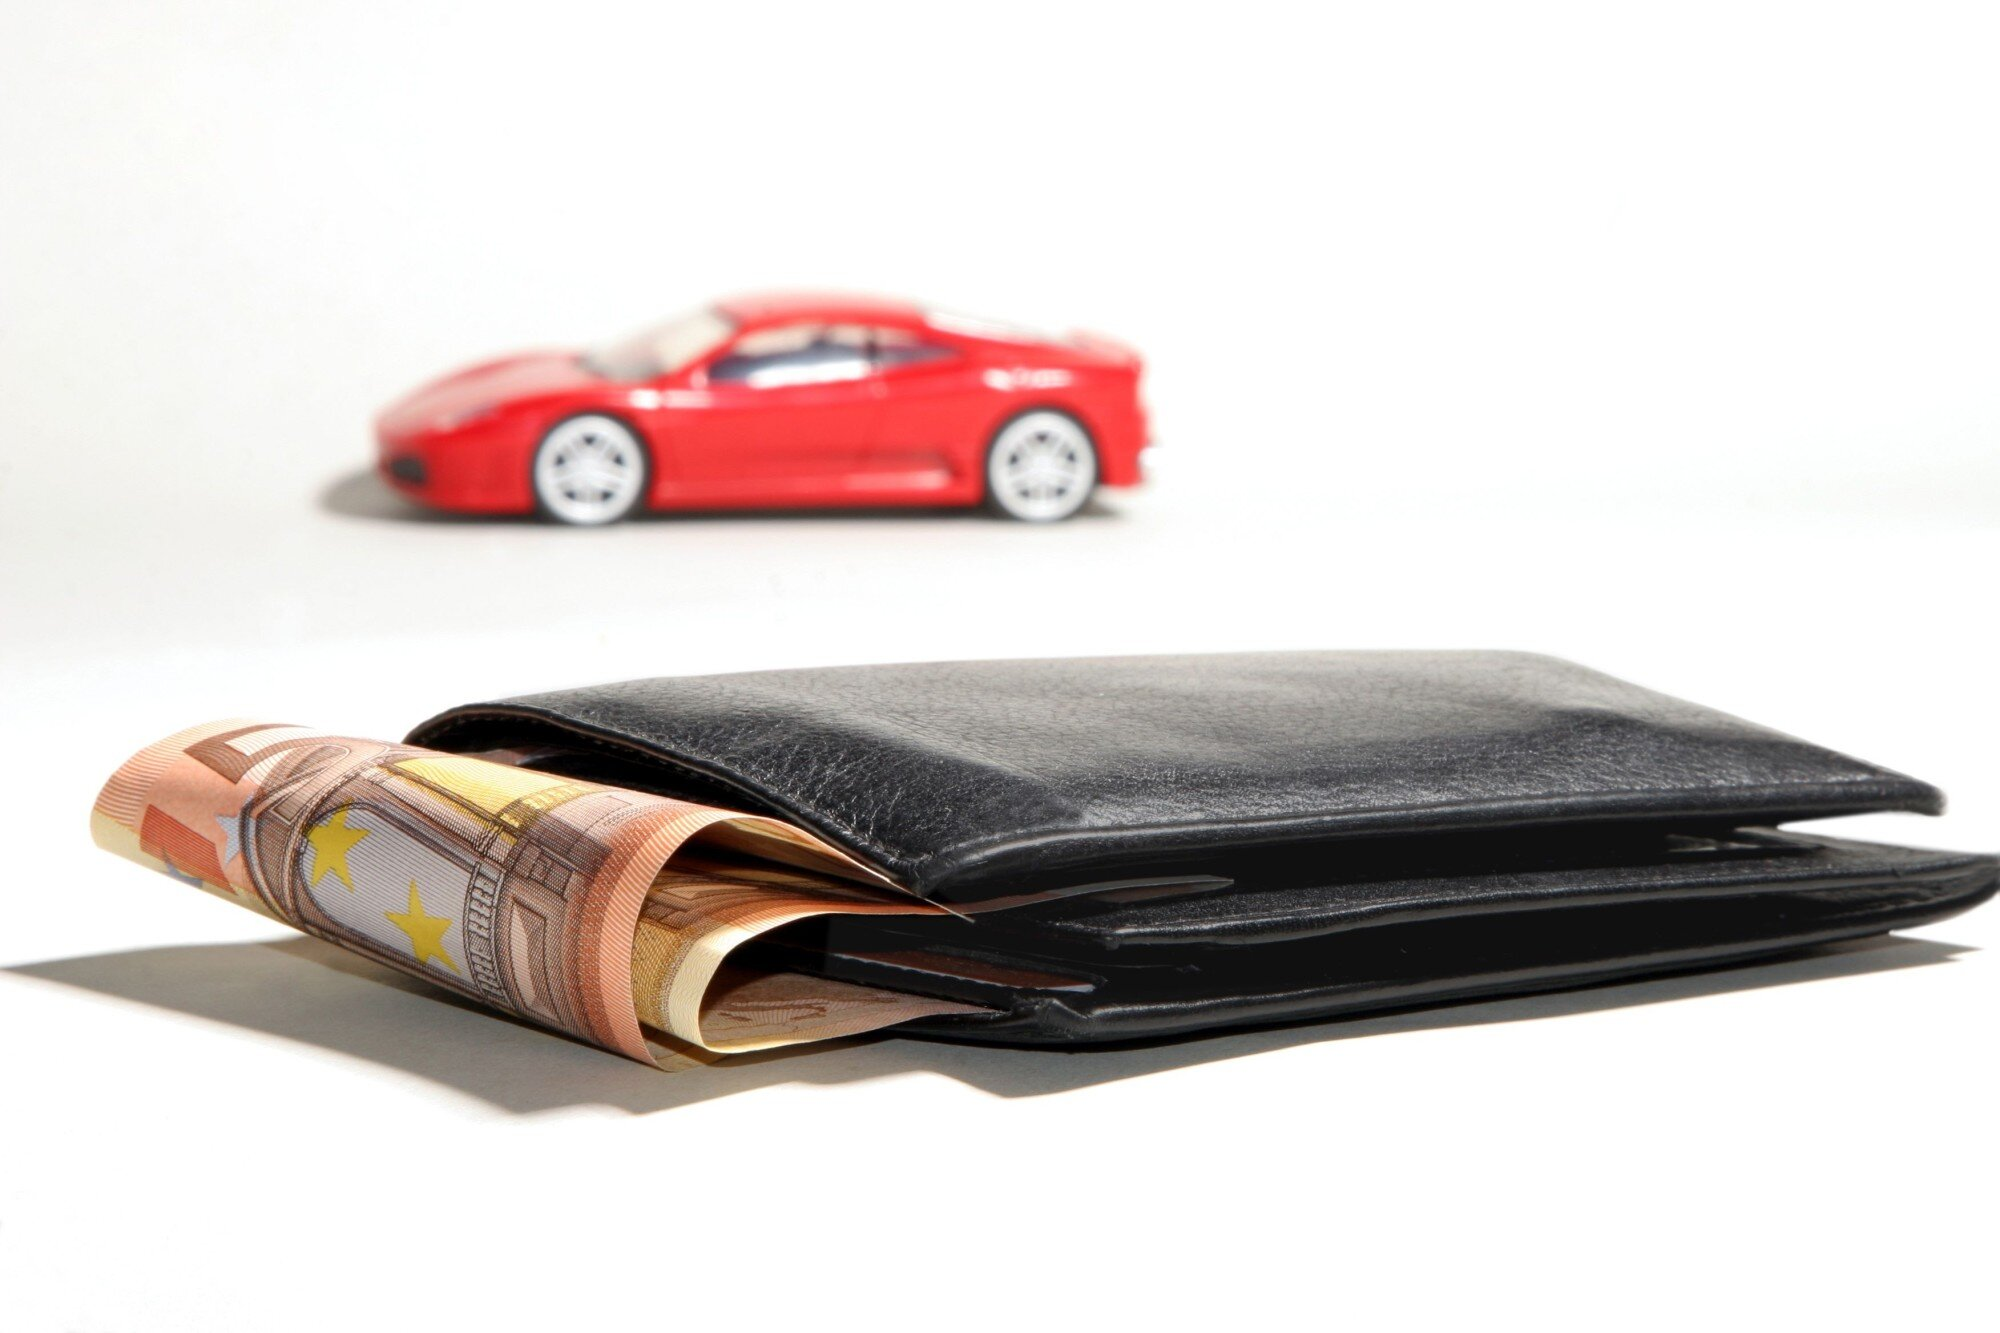 personal loan vs car loan